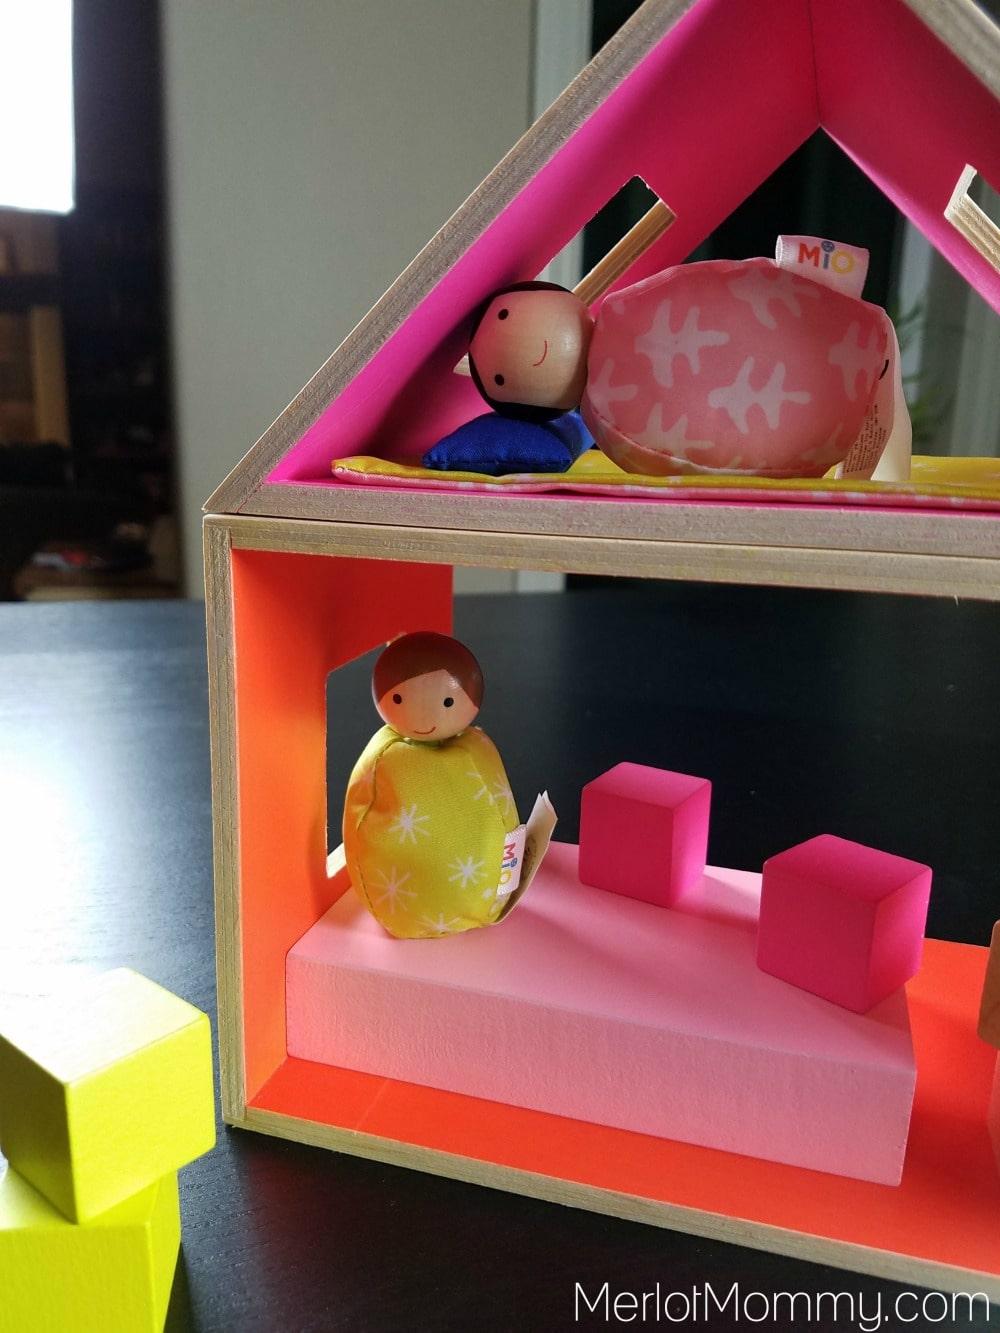 MiO Collection by Manhattan Toy - MiO Sleeping + 2 People set